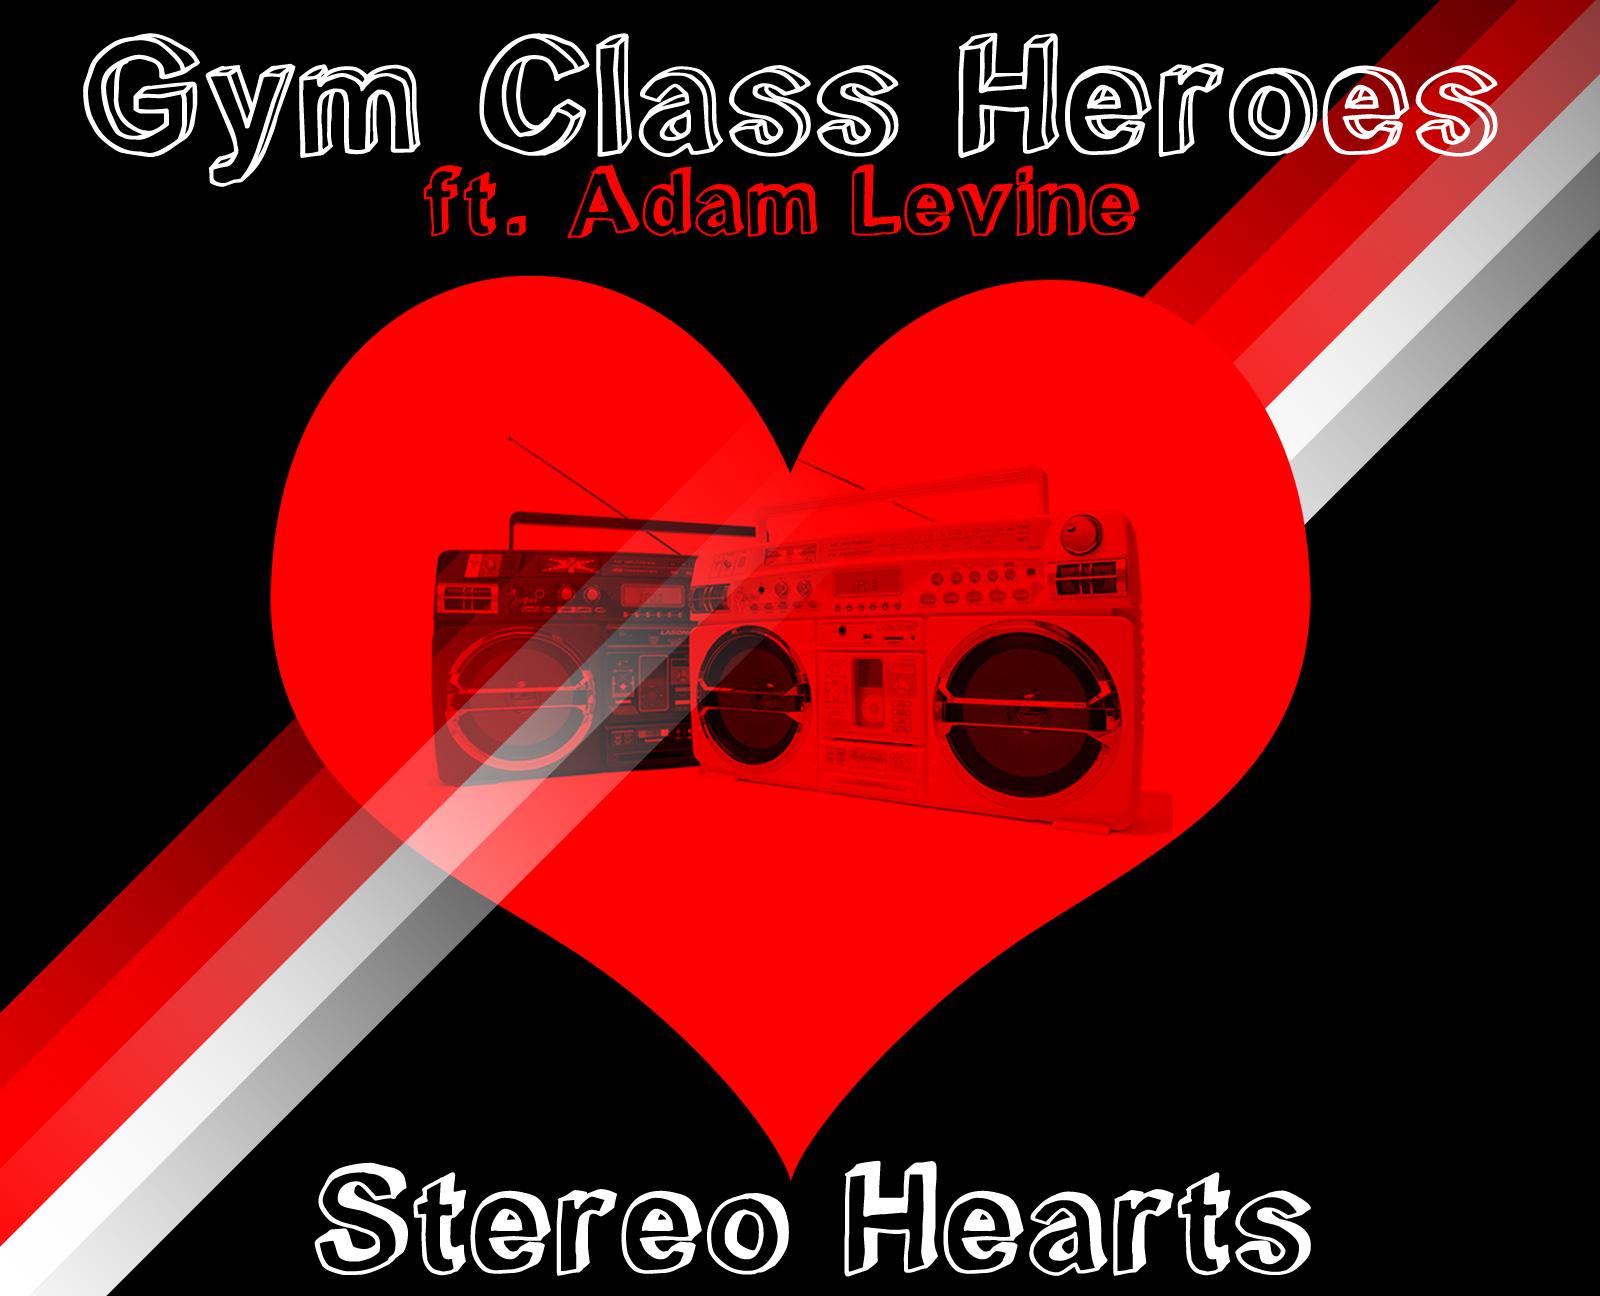 adam levine feat gym class heroes lyrics